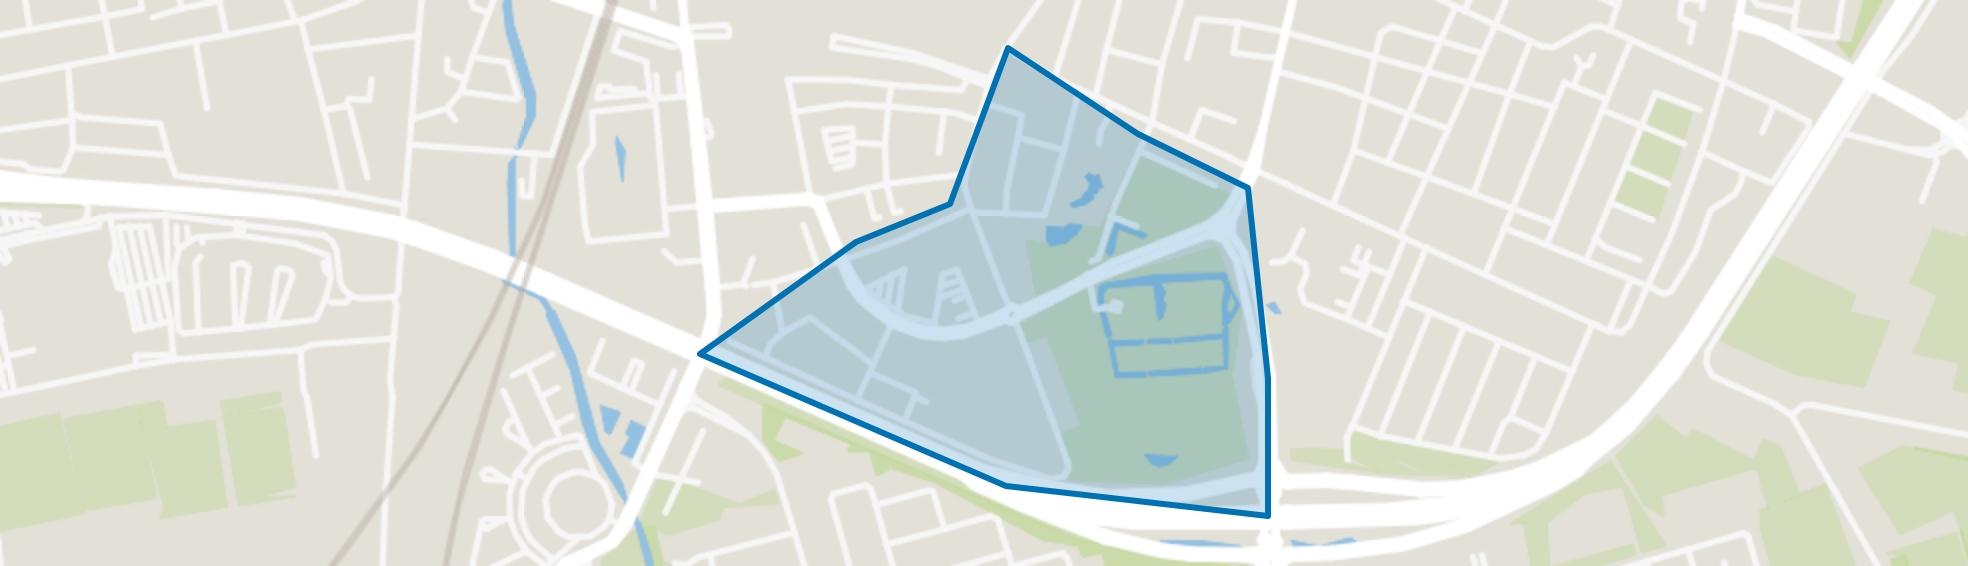 Vrouwenhof, Roosendaal map